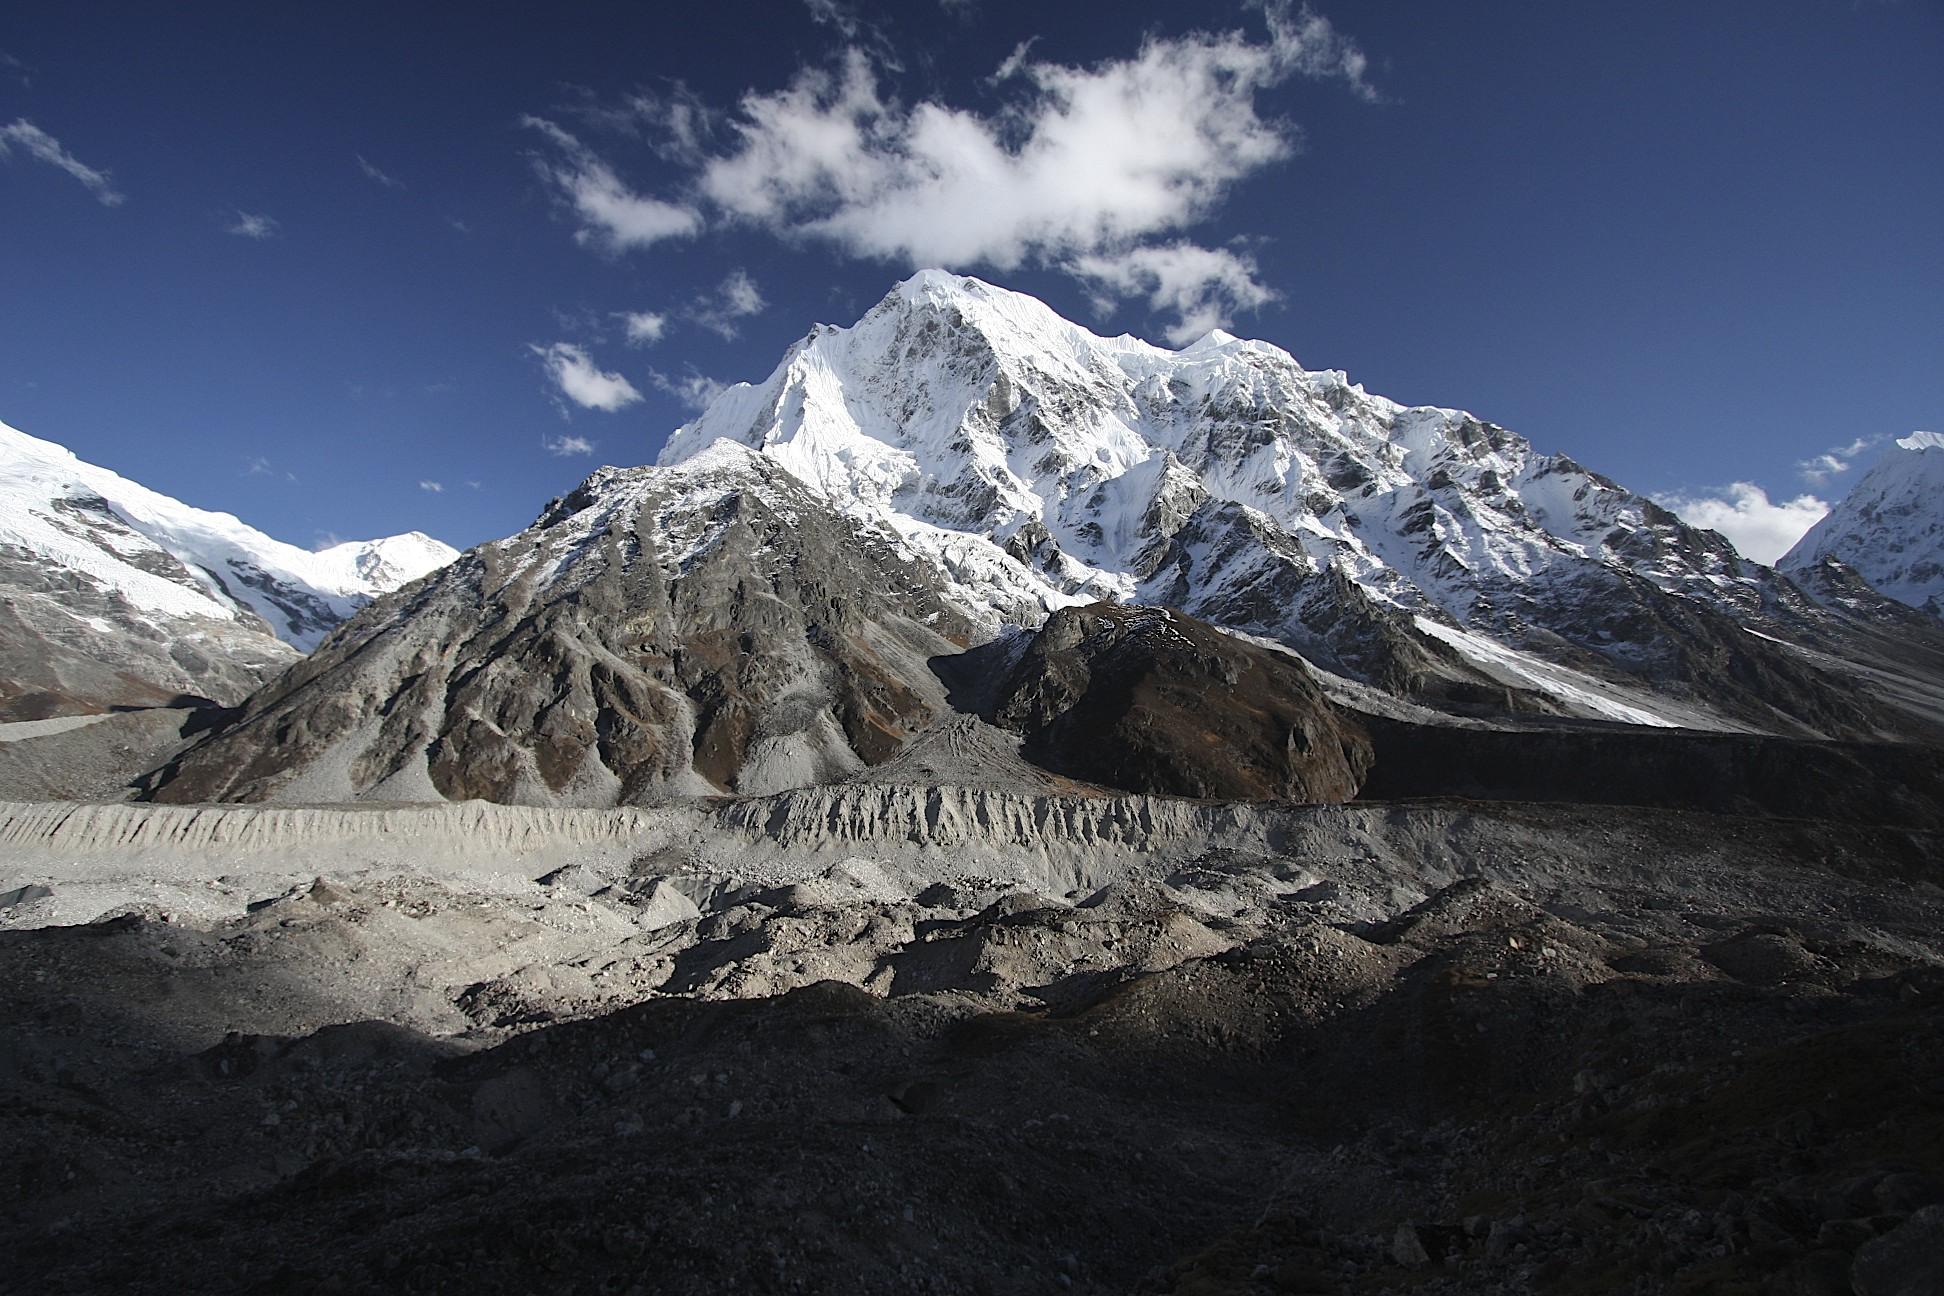 Langtang Glacier and Langshisa Ri Mountain.